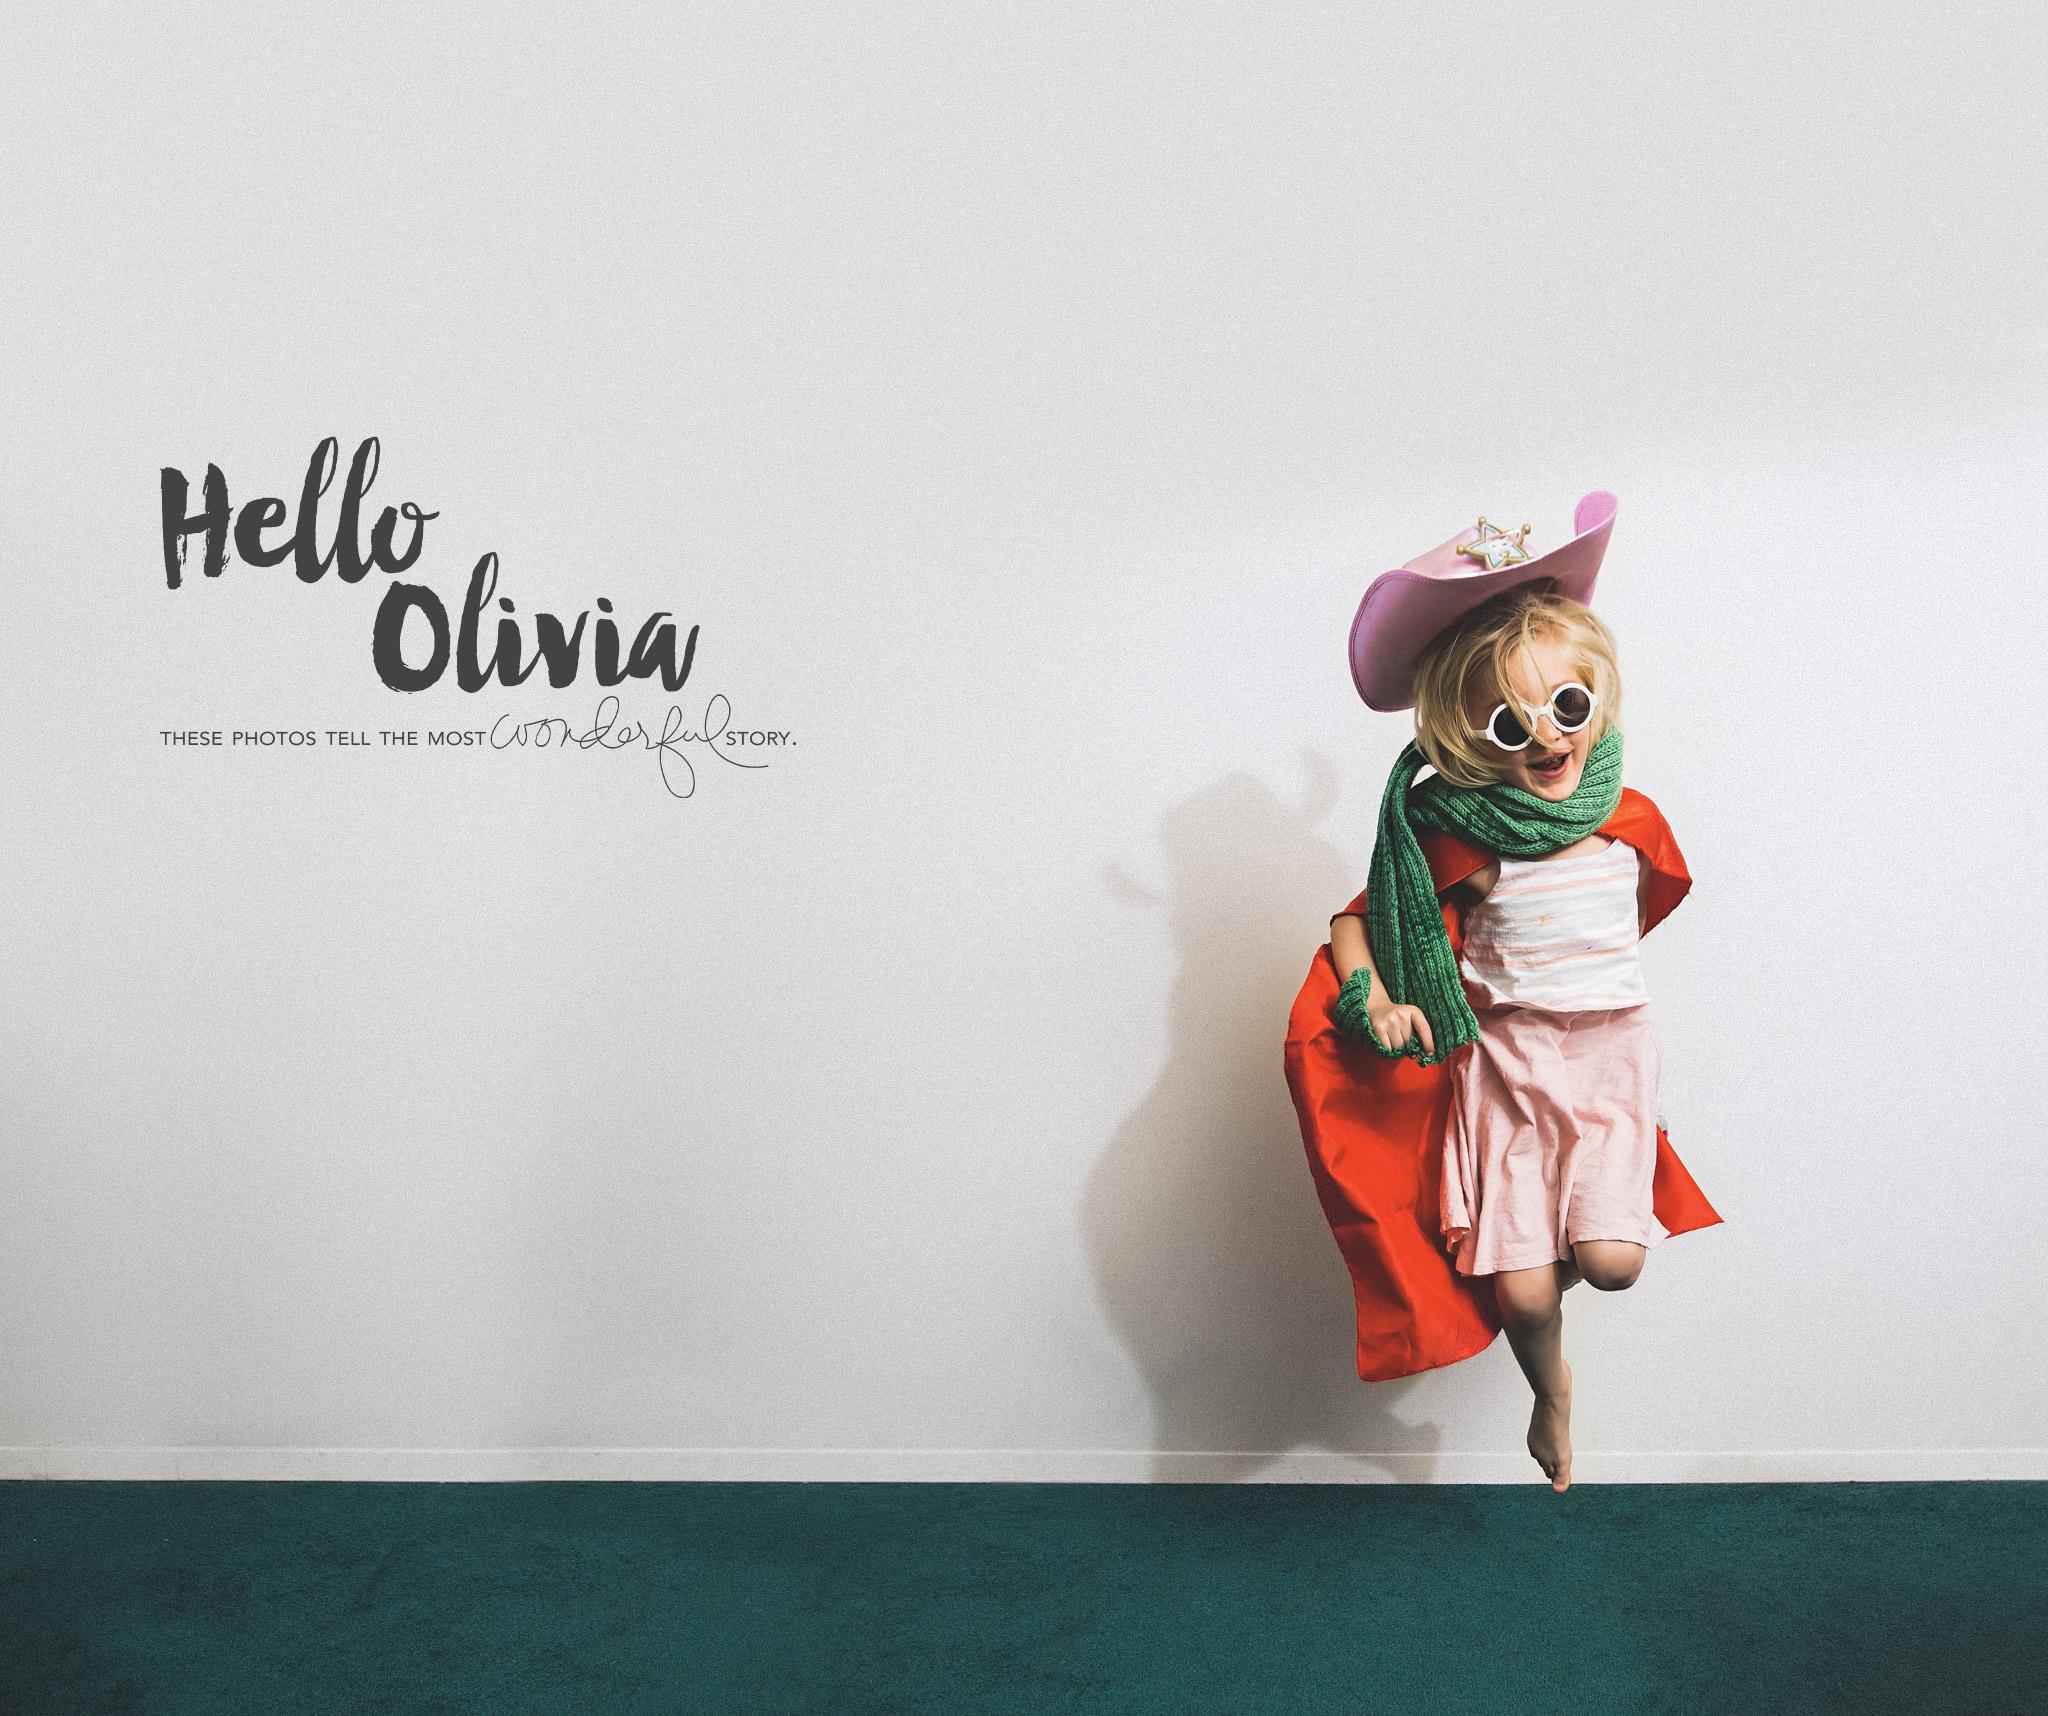 Hello-olivia-photography-long-lsland-family-children-documentary-photographer-childrens-hello-cowboy